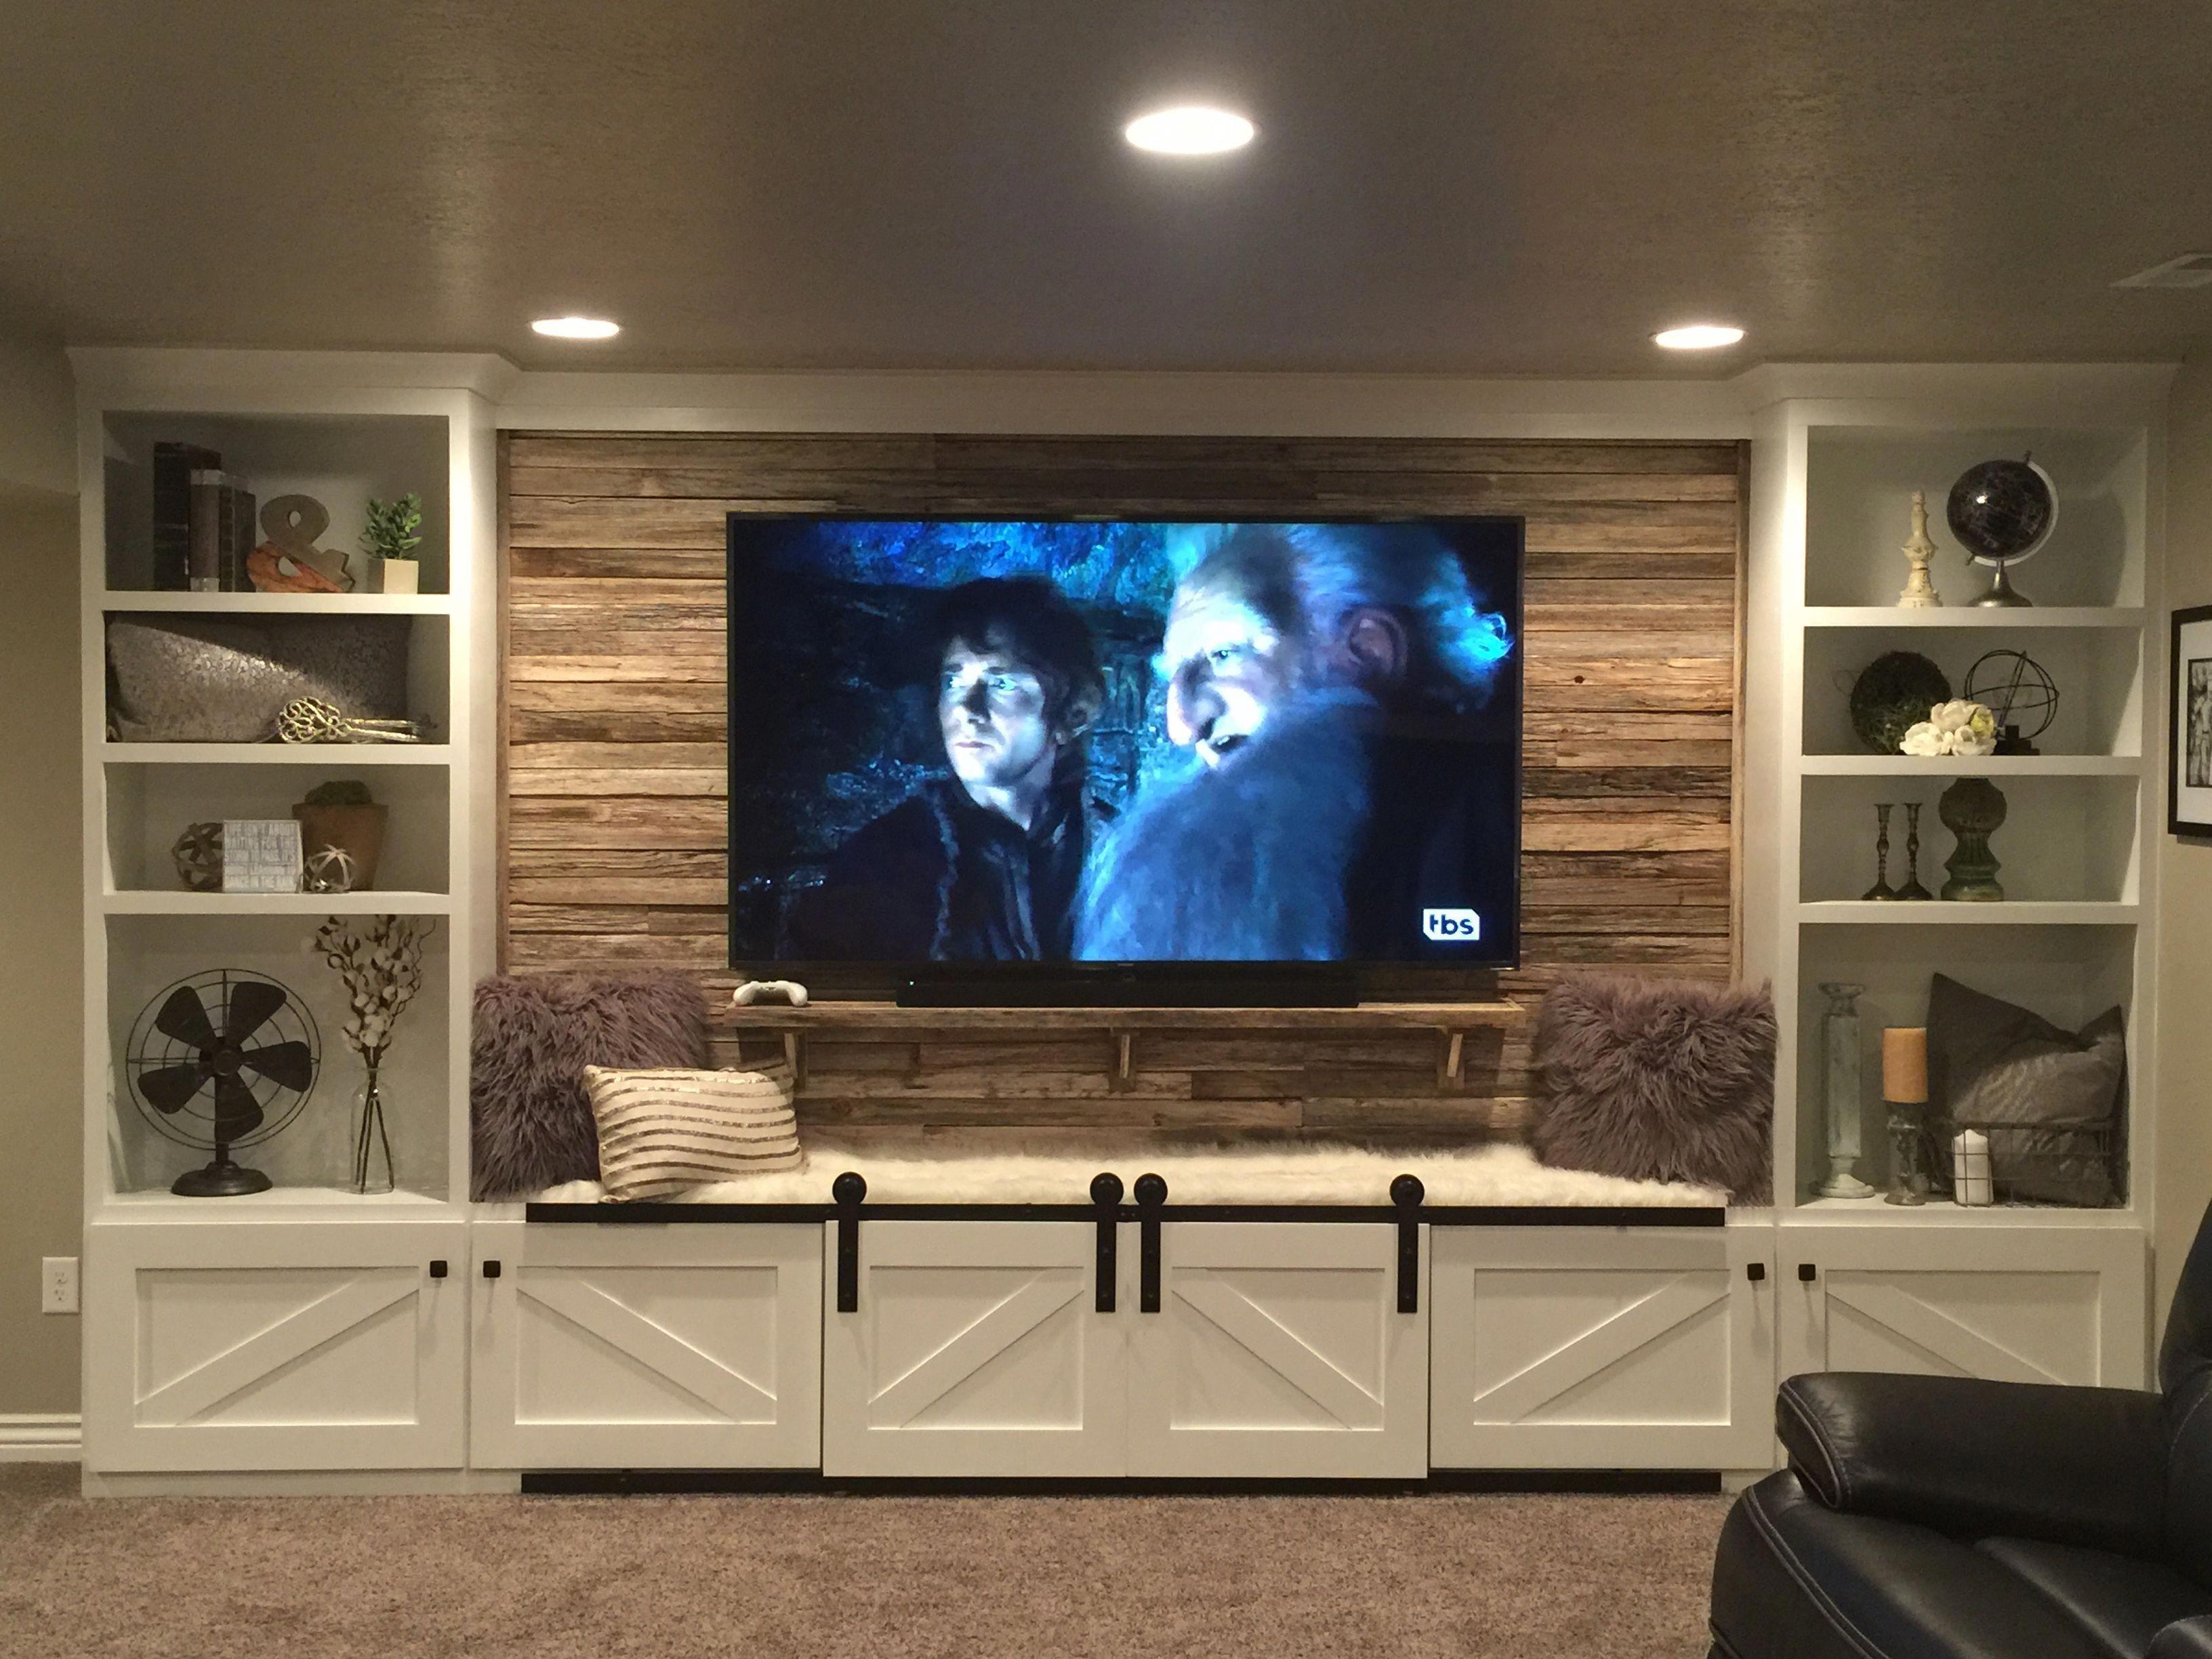 Basement Ceiling Ideas Unfinished Floor Cool For T Living Room Entertainment Center Design